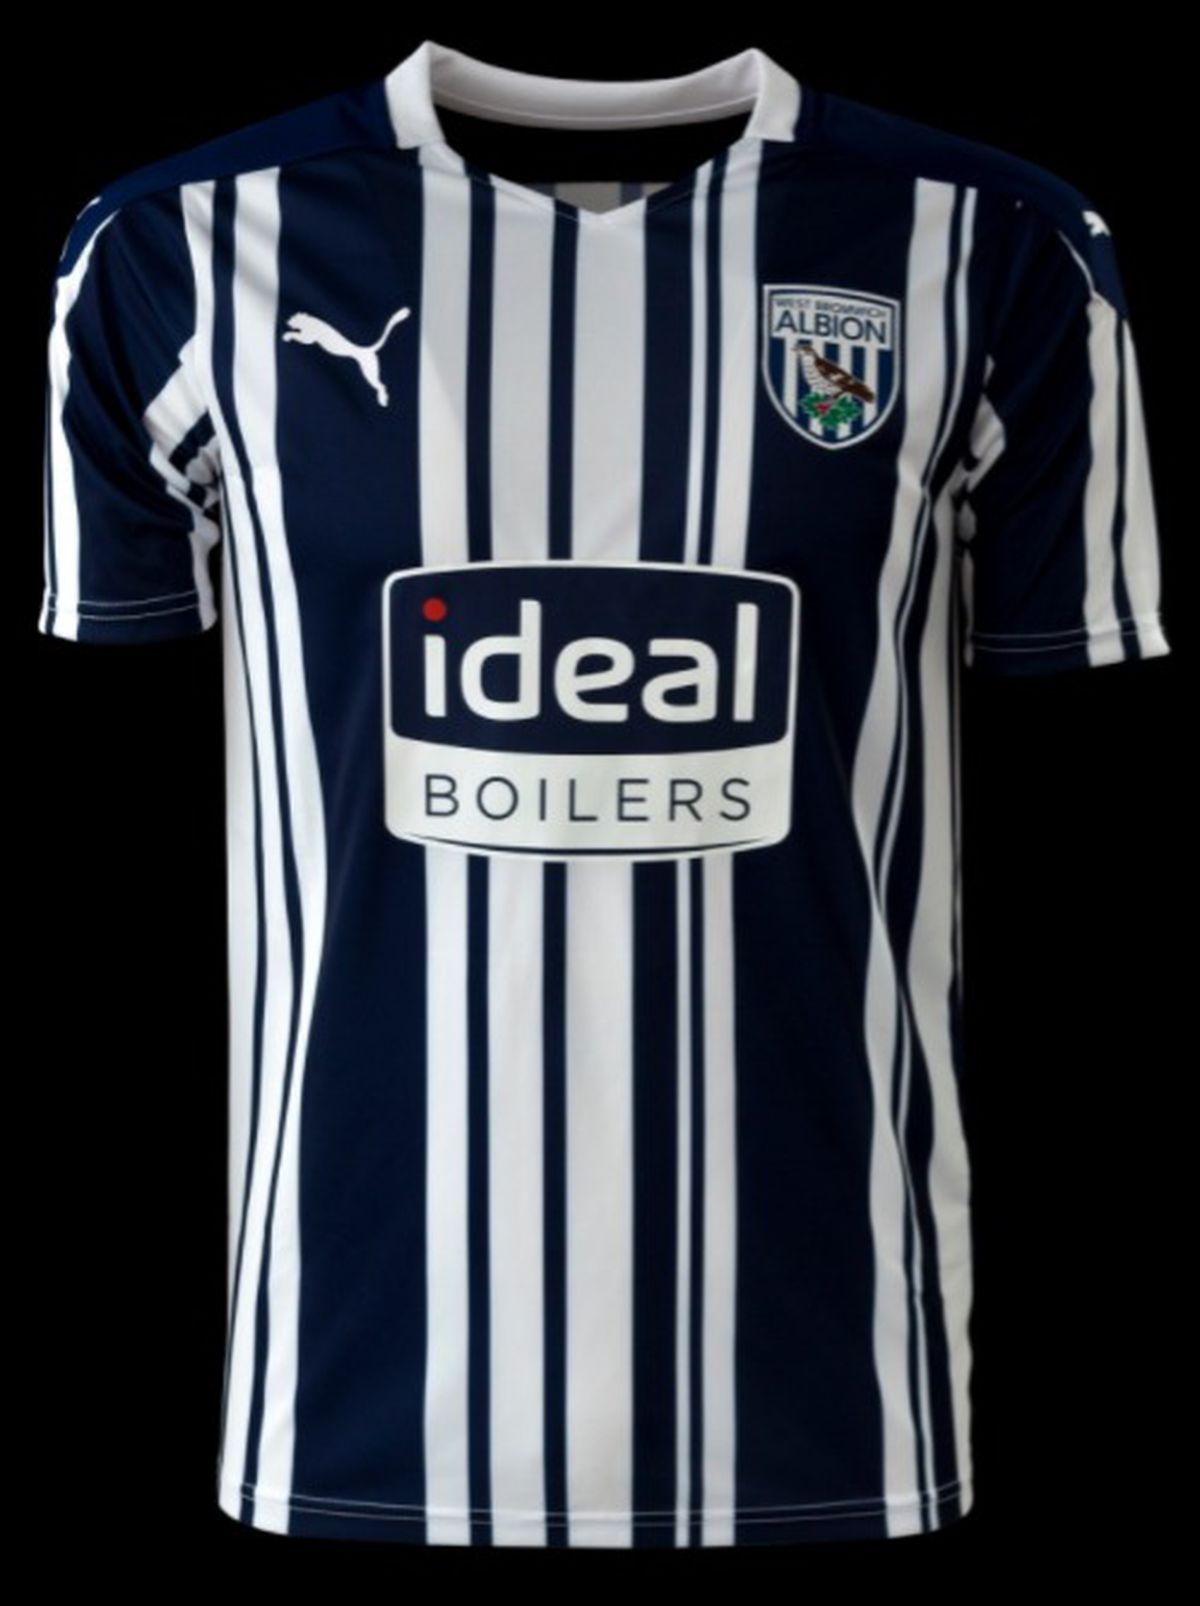 West Brom Reveal Premier League Kit Express Star